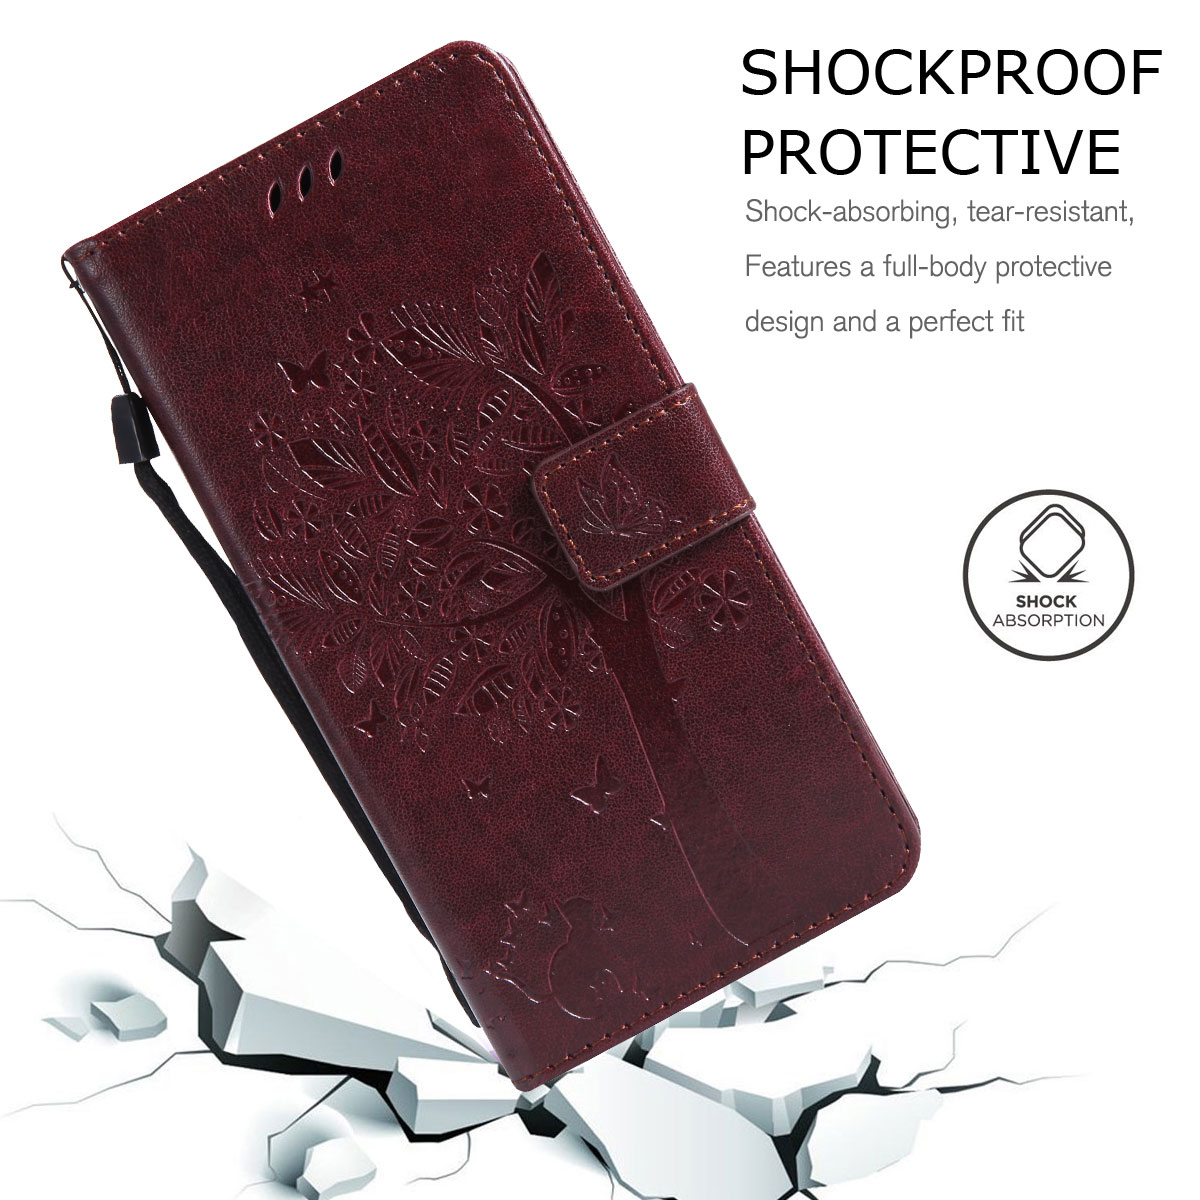 Magnetic-Leather-Credit-Card-Holder-Flip-Case-Cover-For-Google-Pixel-2-2-XL thumbnail 81